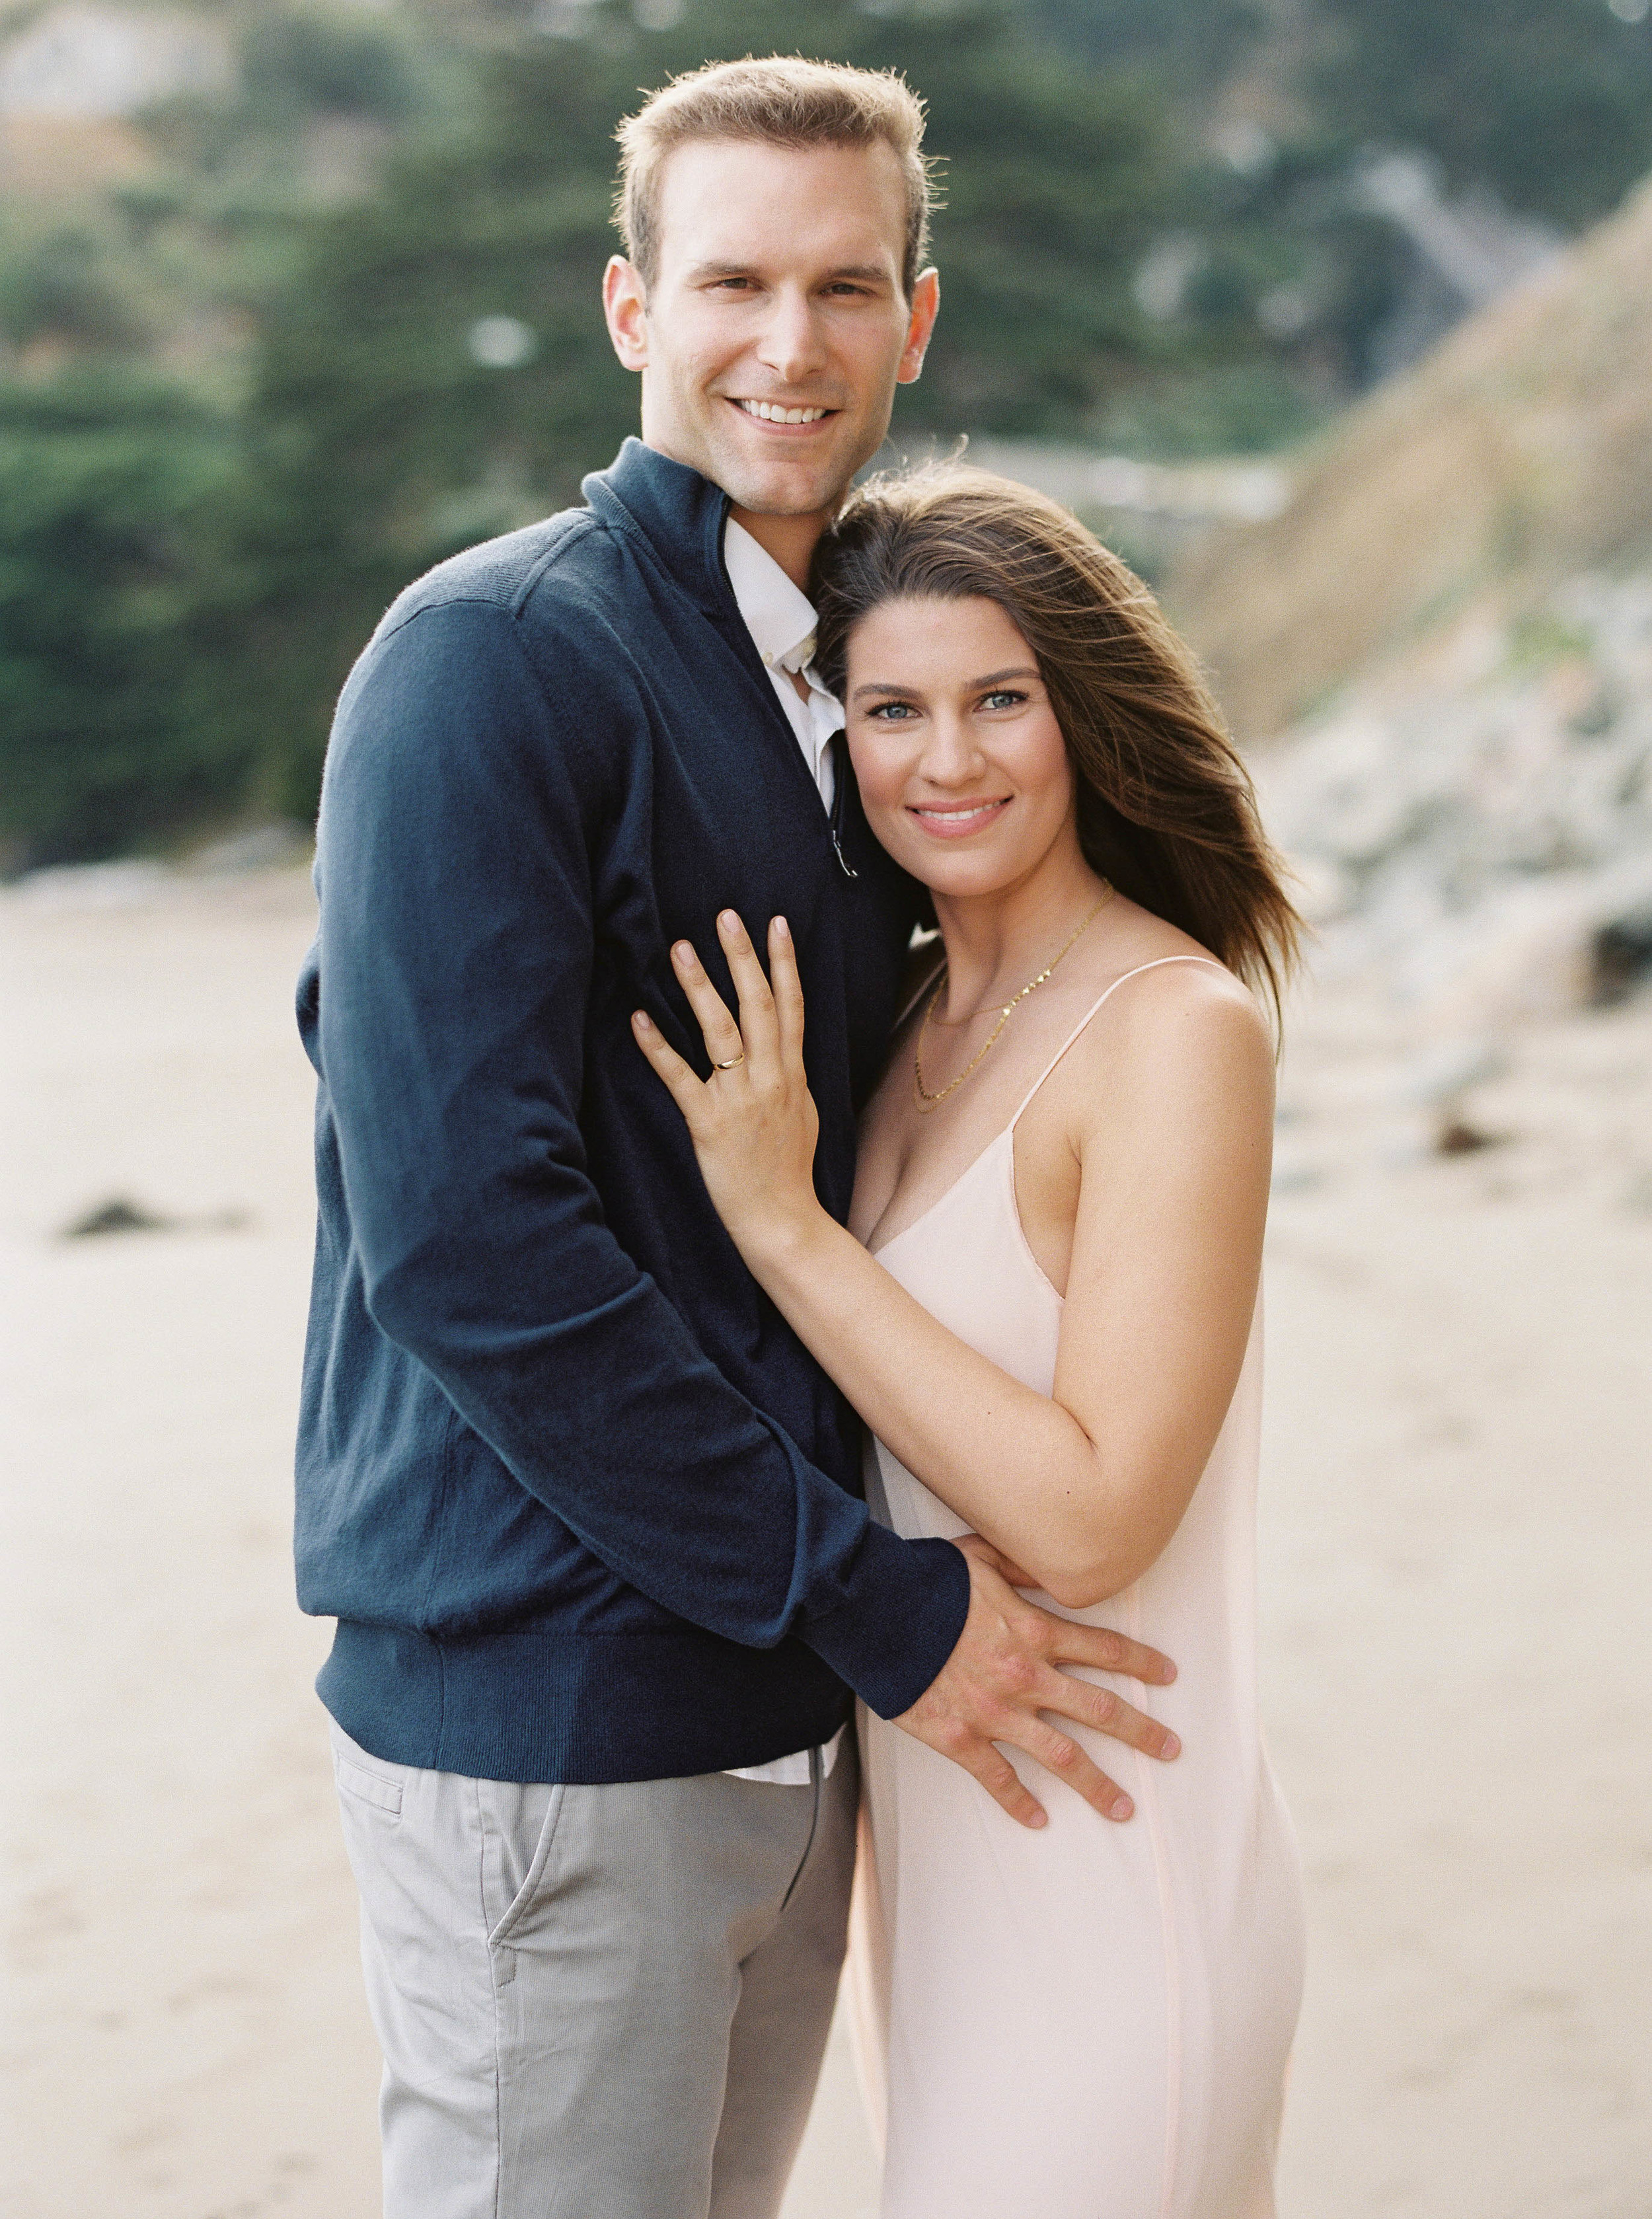 Meghan Mehan Photography - Fine Art Film Wedding Photography - San Francisco | Napa | Sonoma | Big Sur | Santa Barbara - 004.jpg